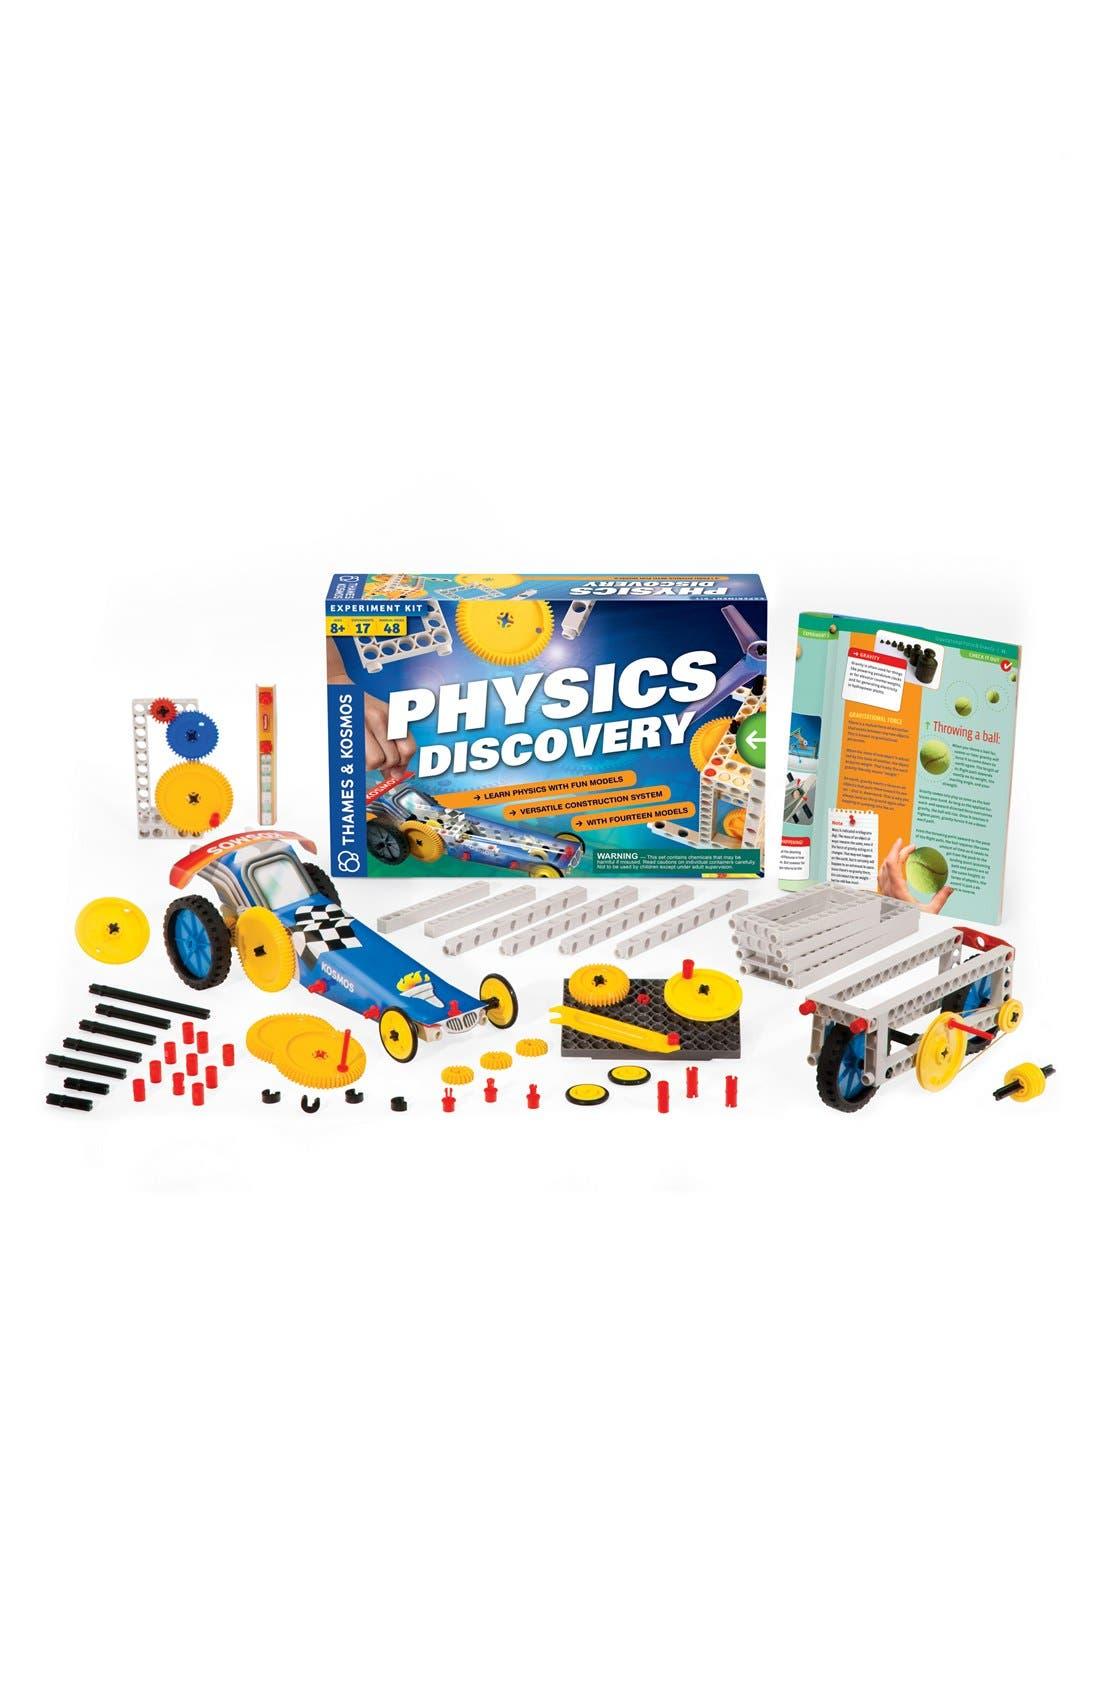 'Physics Discovery 2.0' Experiment Kit,                             Main thumbnail 1, color,                             NONE